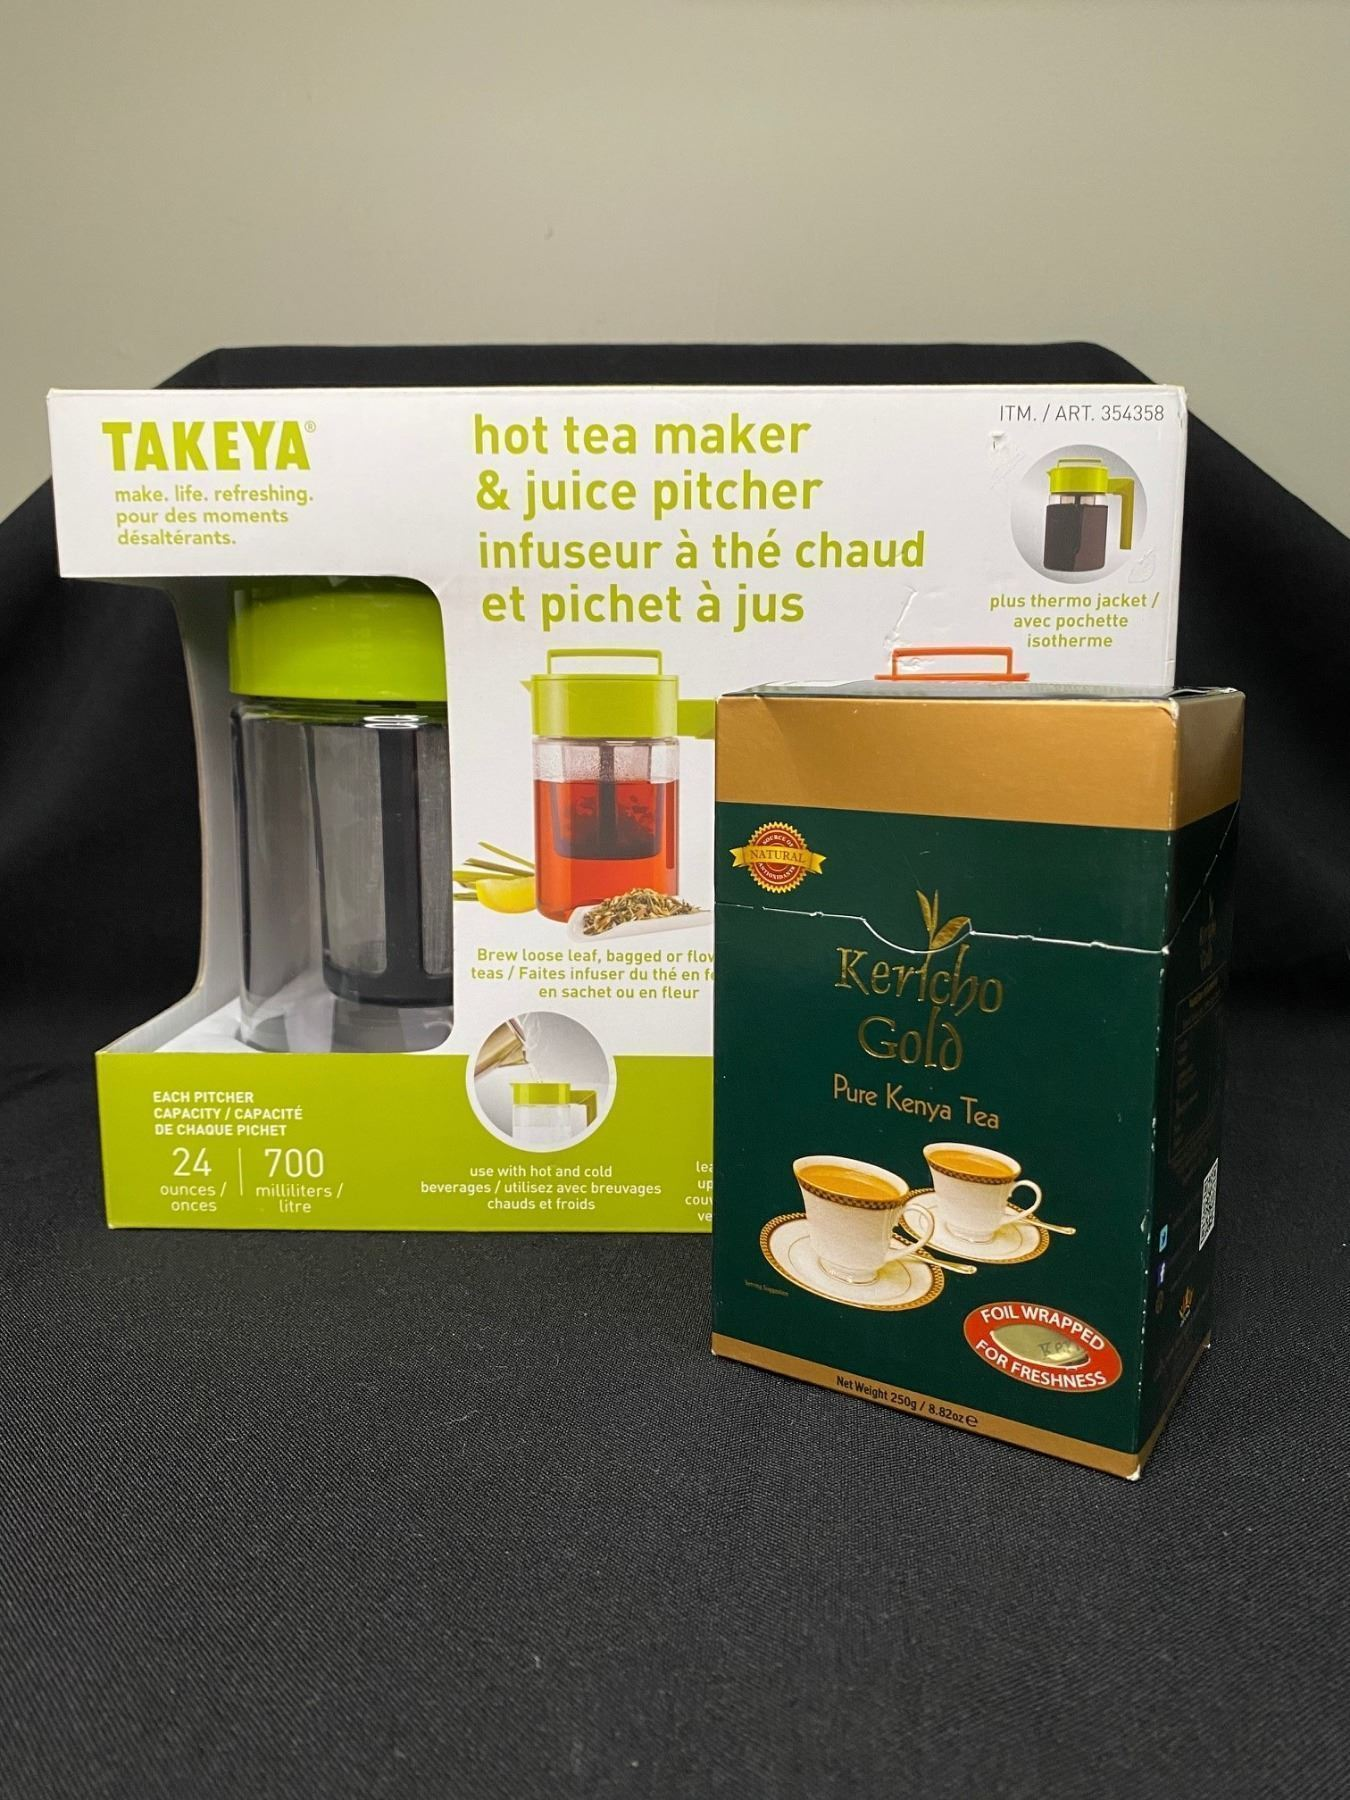 Takeya Hot Tea Maker & Juice Pitcher